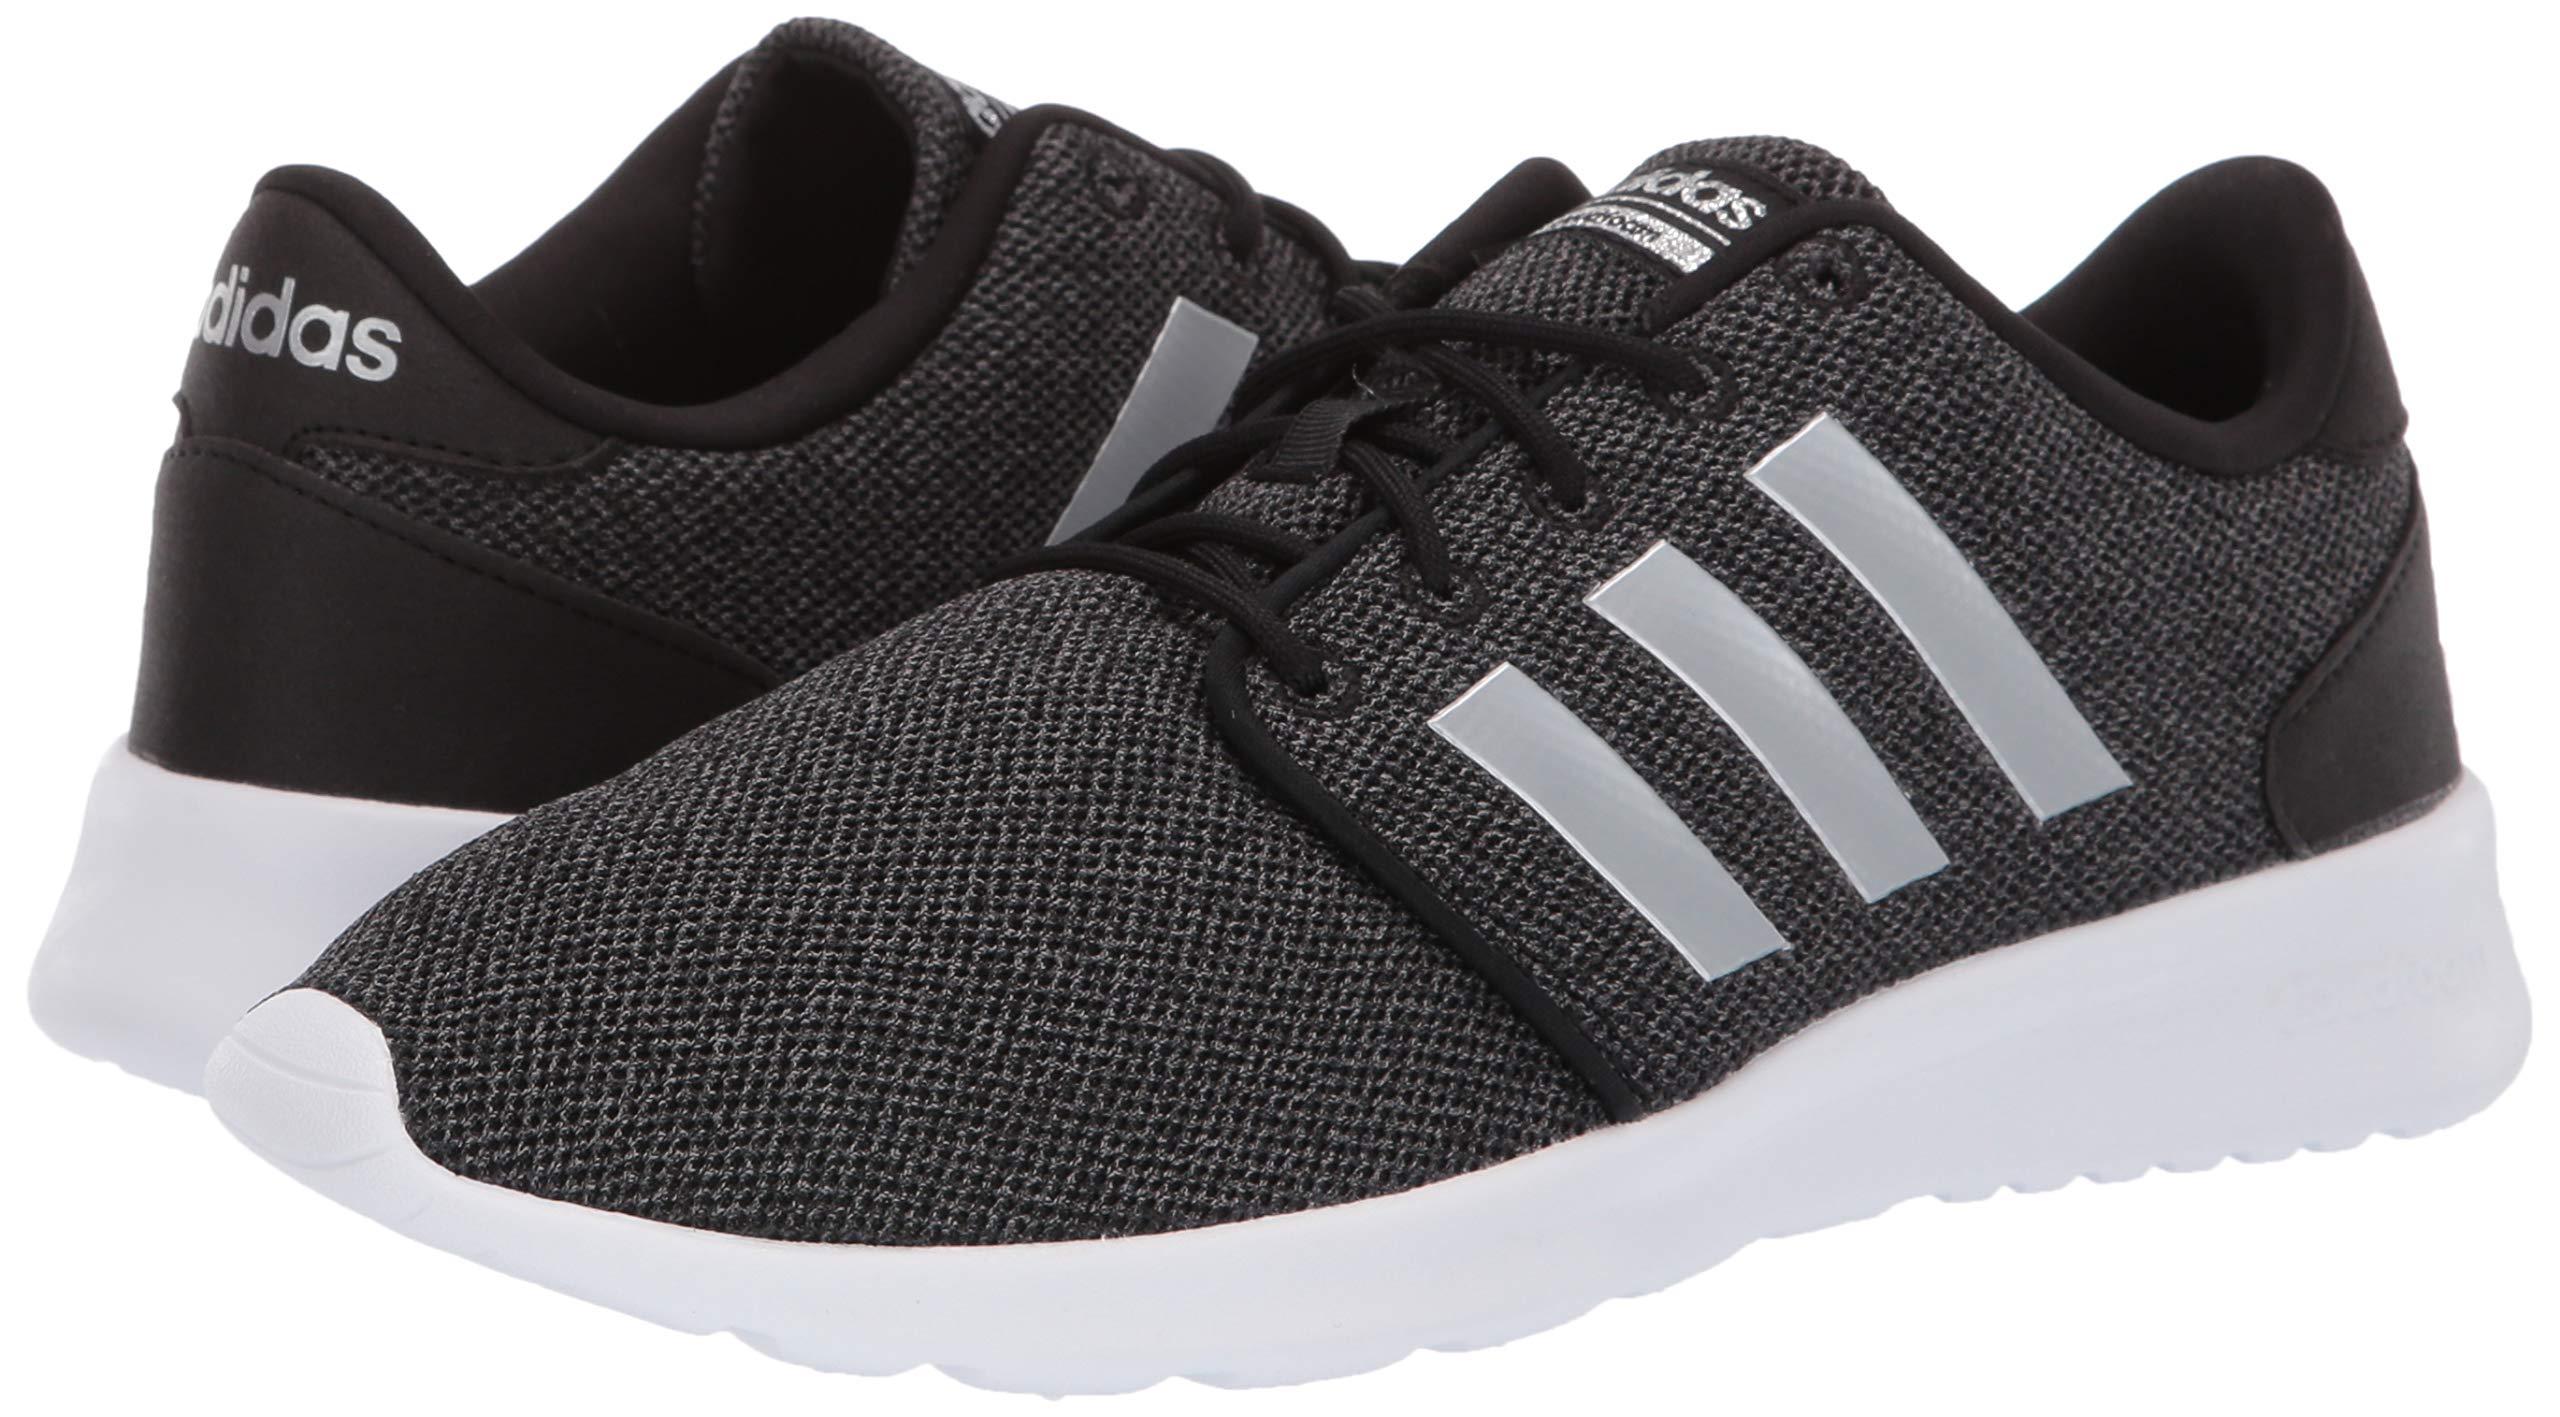 adidas Women's Cloudfoam Qt Racer Sneaker, Black/Silver Metallic/Grey, 5.5 M US by adidas (Image #5)